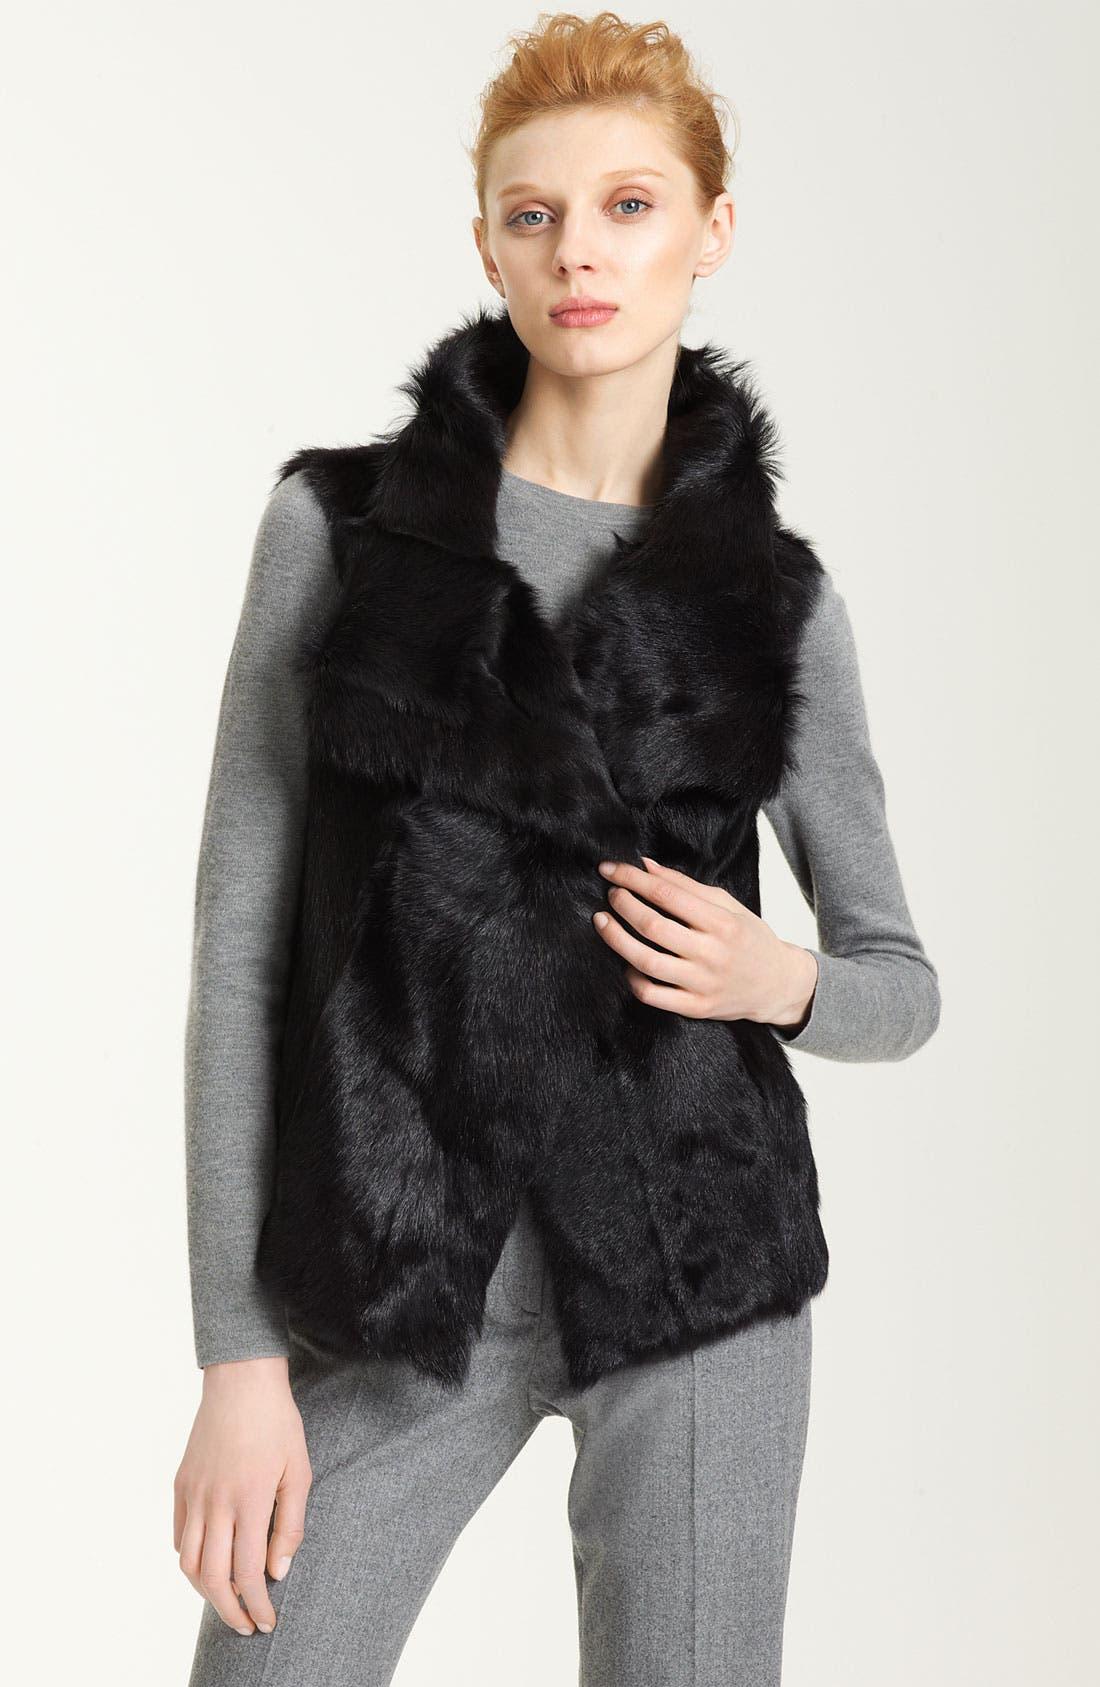 Alternate Image 1 Selected - Pologeorgis Genuine Fur Vest